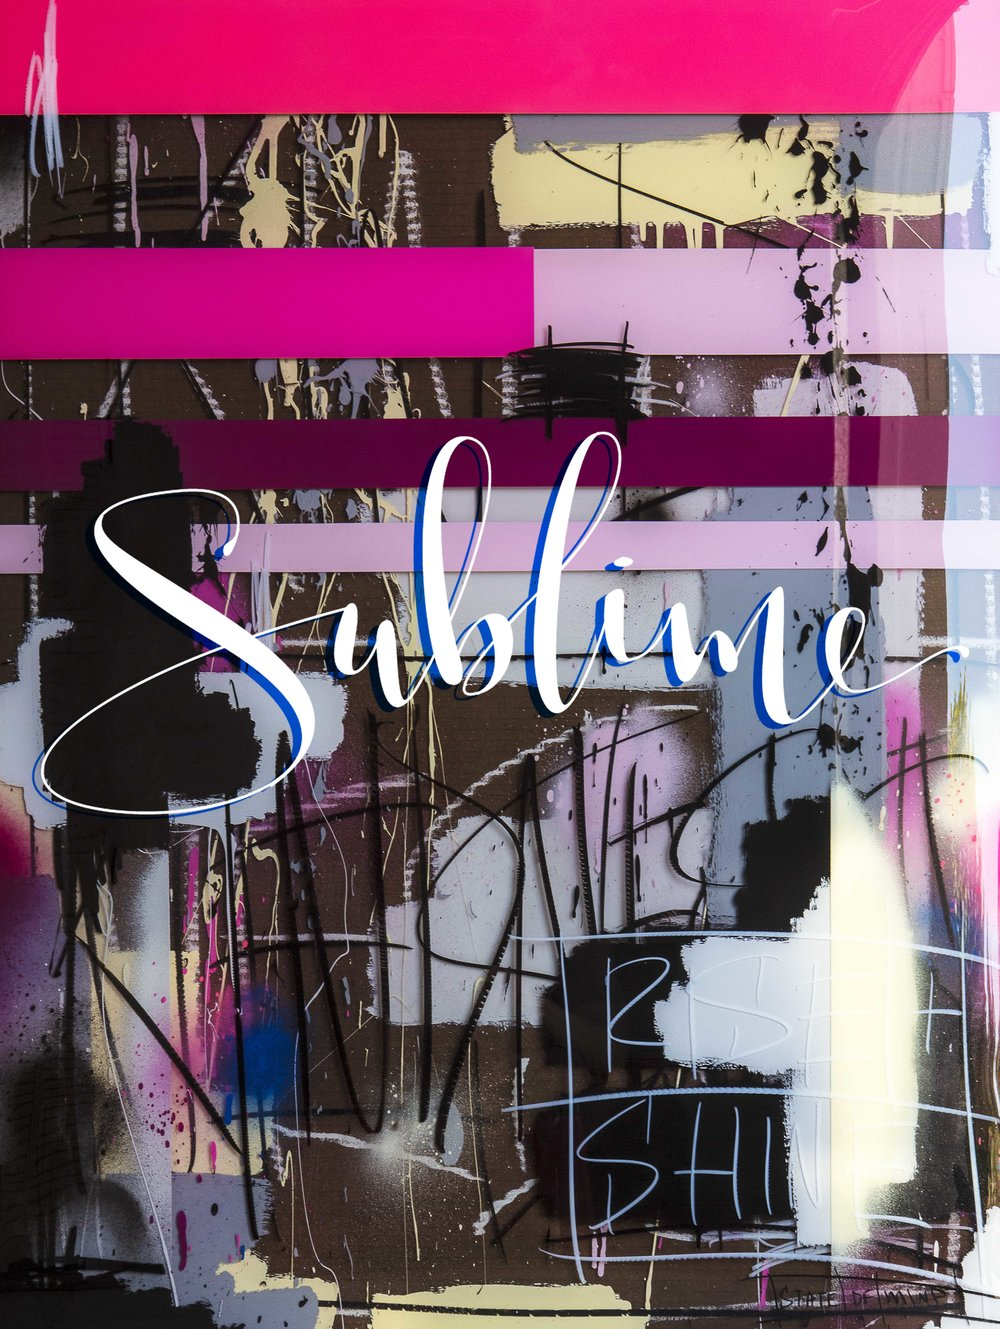 SUBLIME :: AUG 3 - SEPT 21  feat. Jeremy Brown, Lela Brunet, Elliston Roshi, BLOCKHEAD, Phil Harris  see more